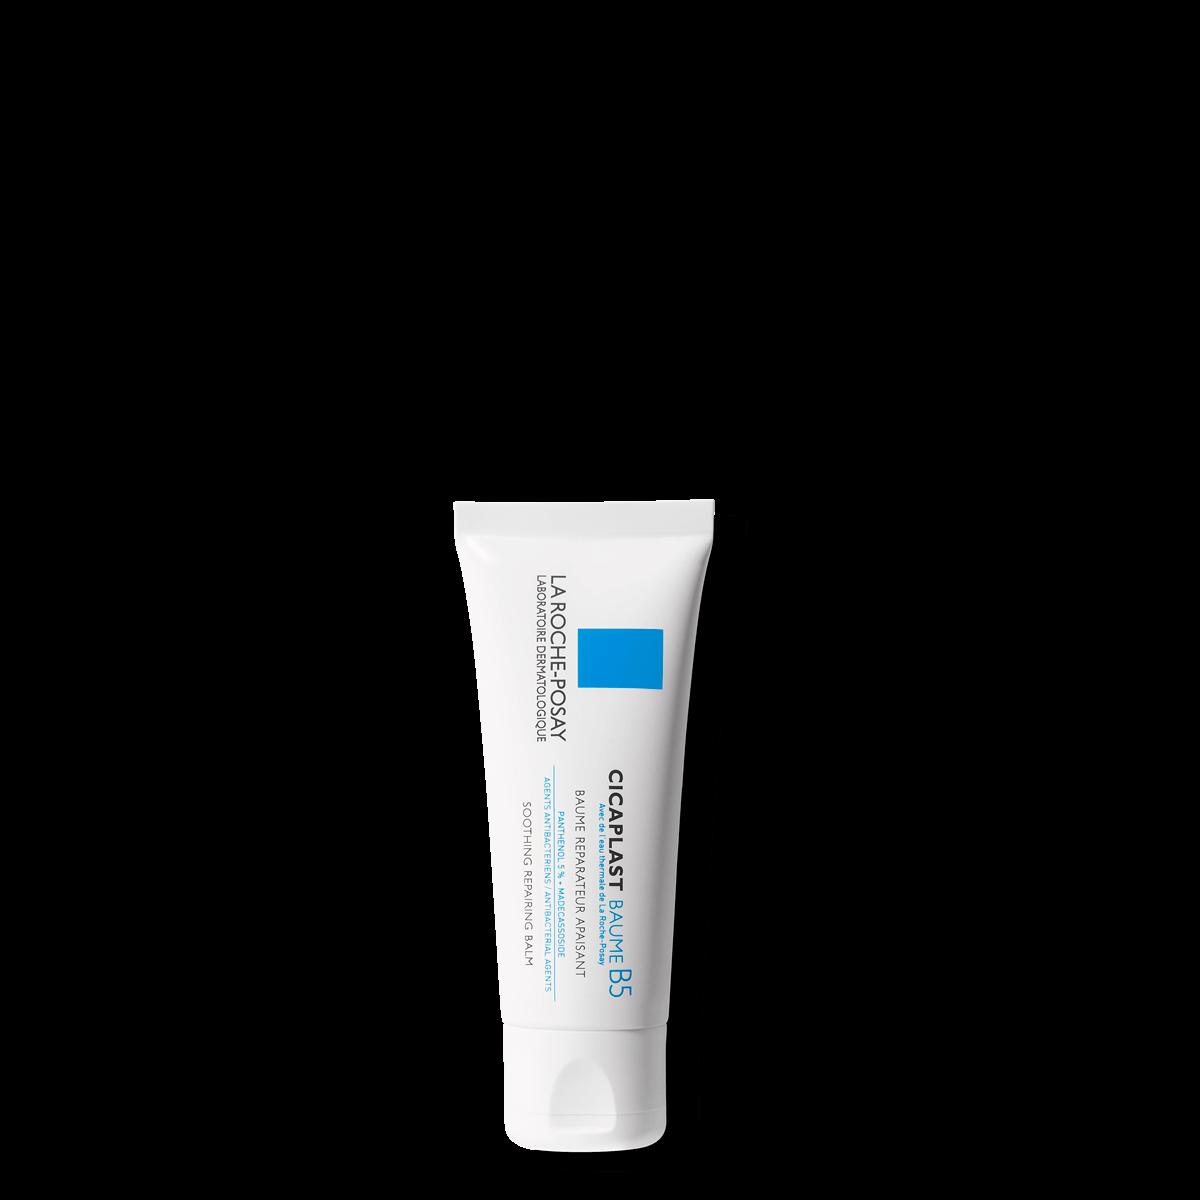 La Roche Posay ProductPage Damaged Cicaplast Baume B5 40ml 33378724129